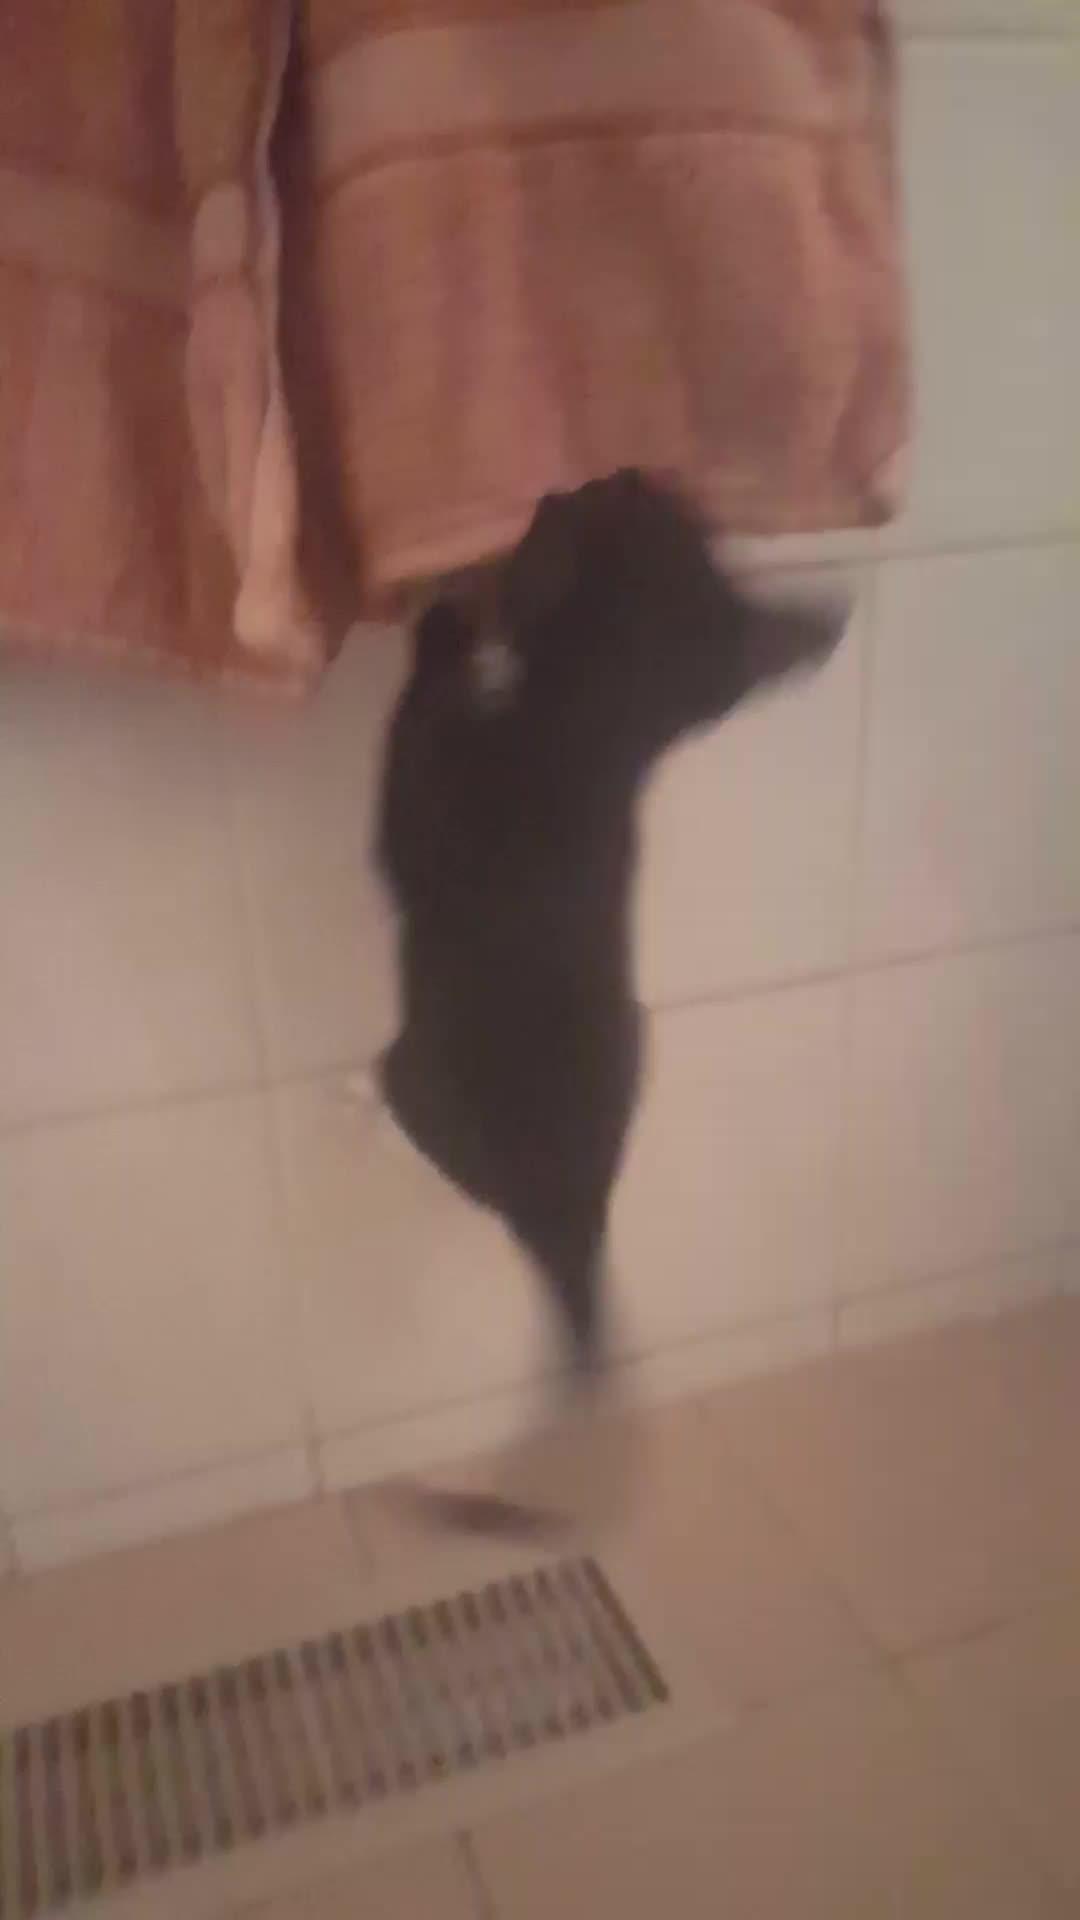 AnimalsBeingJerks, kittengifs, animalsbeingjerks GIFs